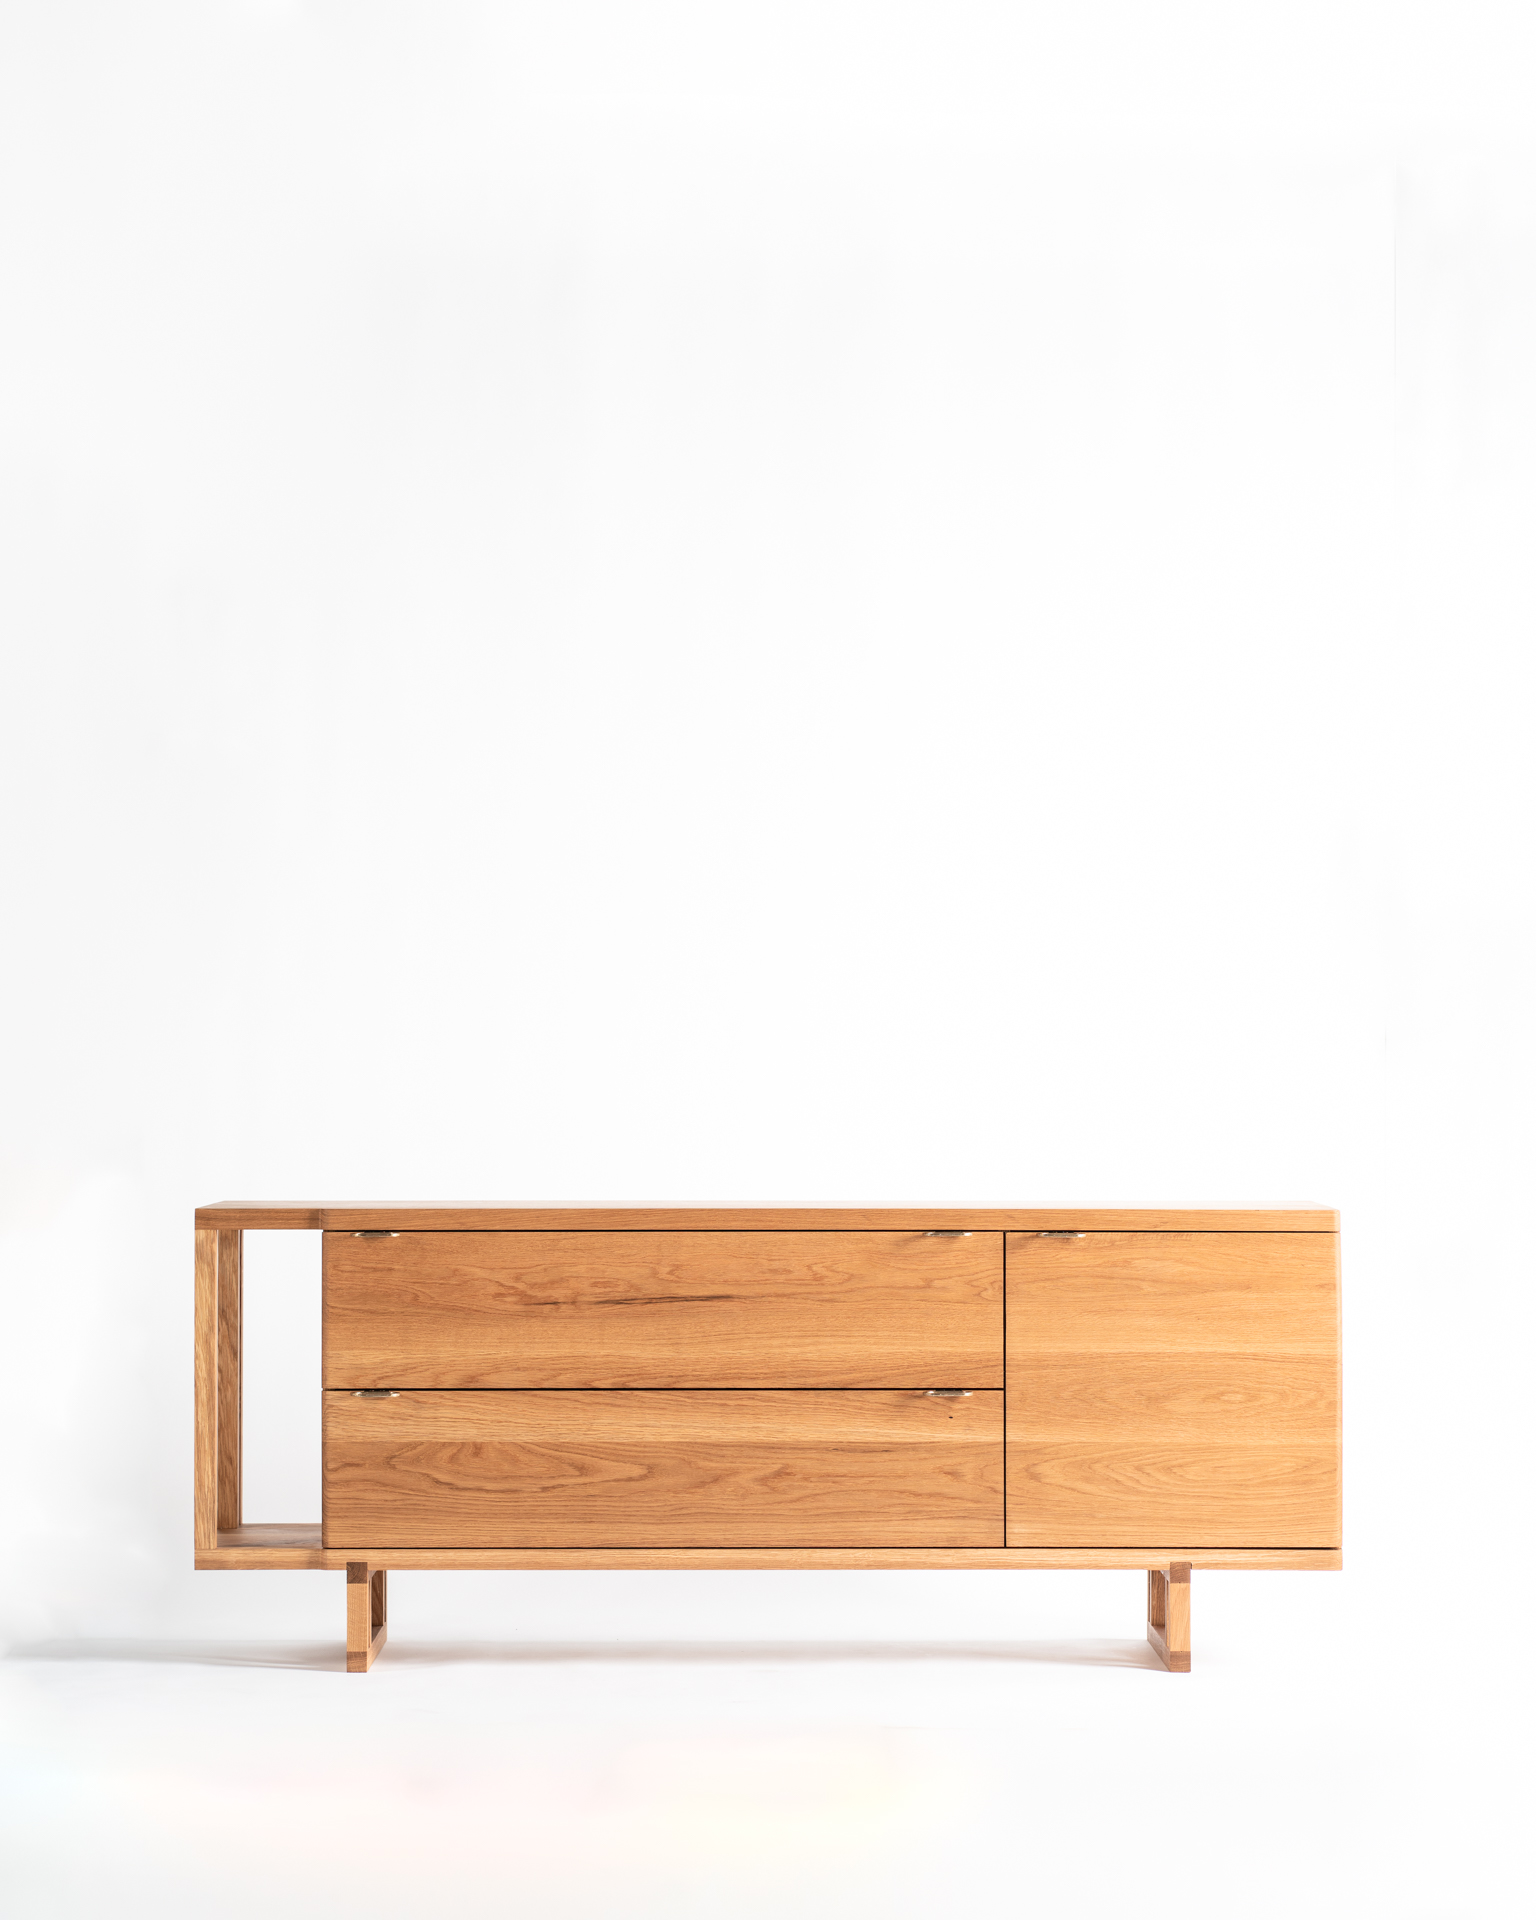 Furniture-web-49.jpg